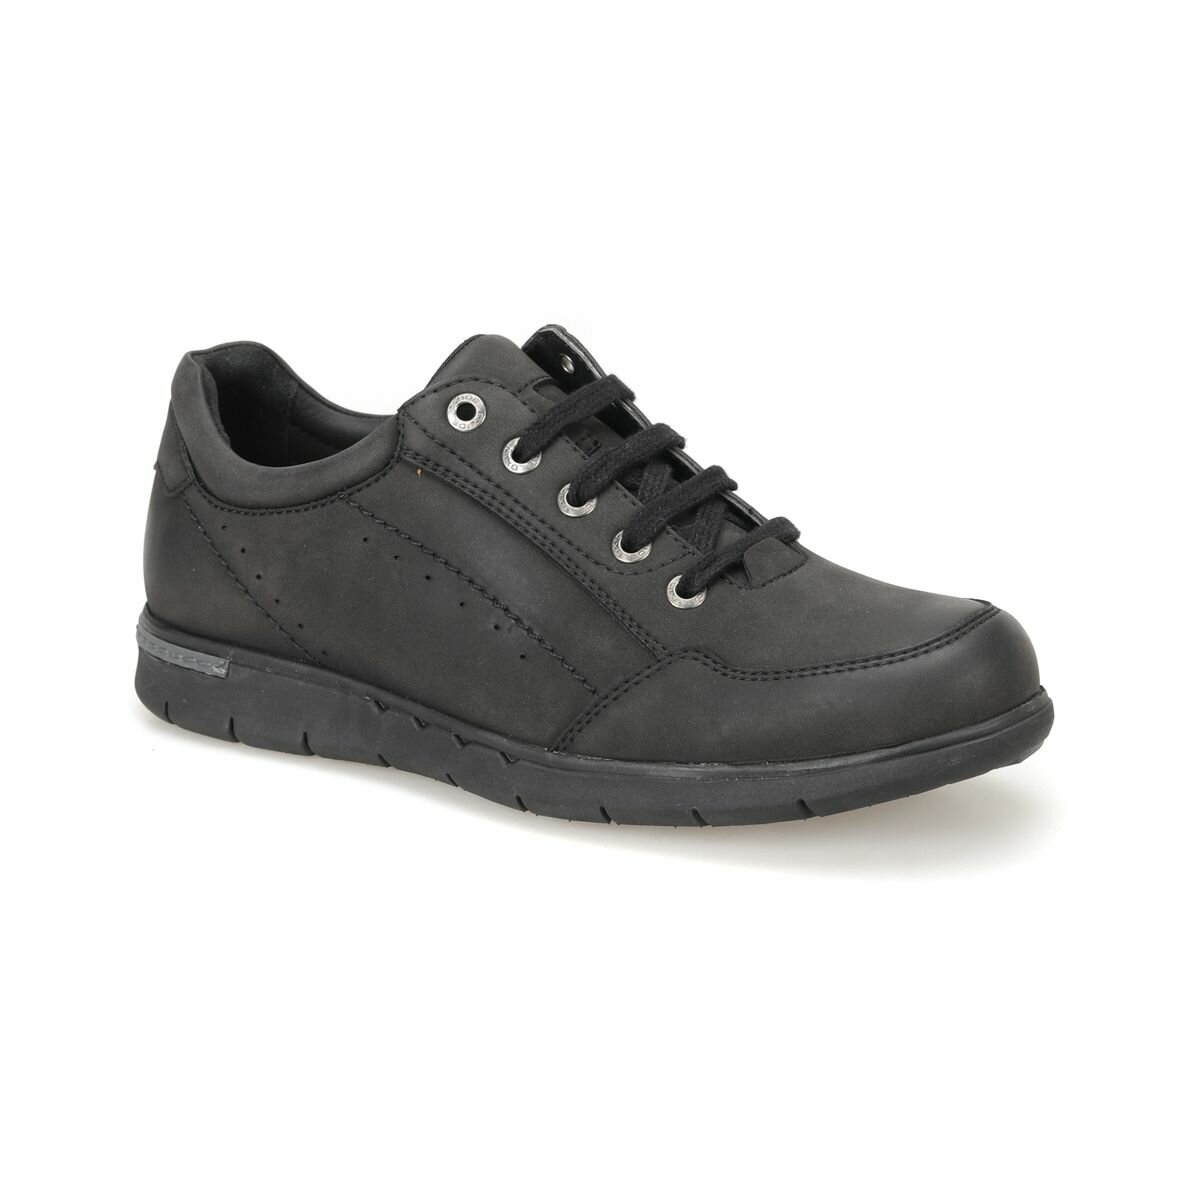 FLO 7SF-308-C Black Men 'S Classic Shoes Flexall